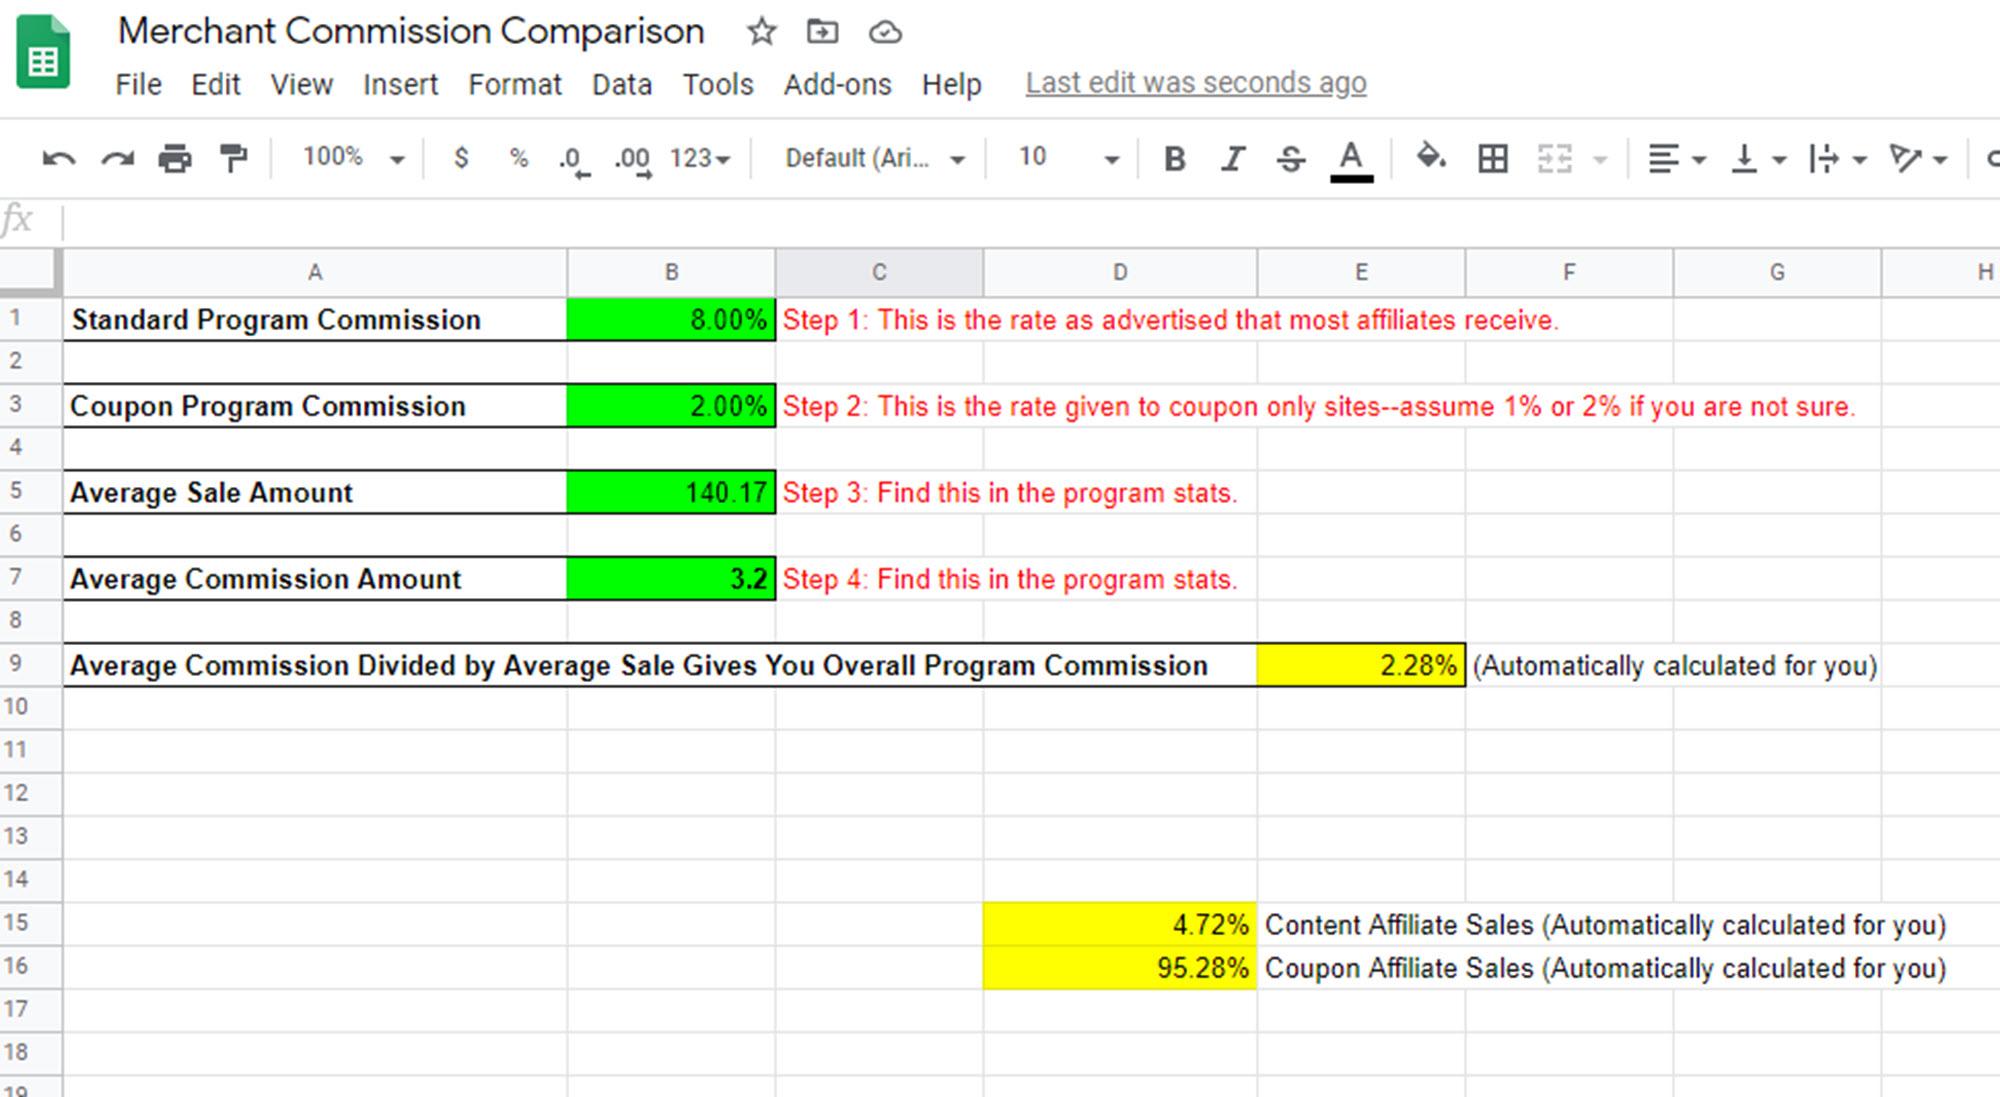 Calculate Content Versus Coupon Ratio for Your Merchants